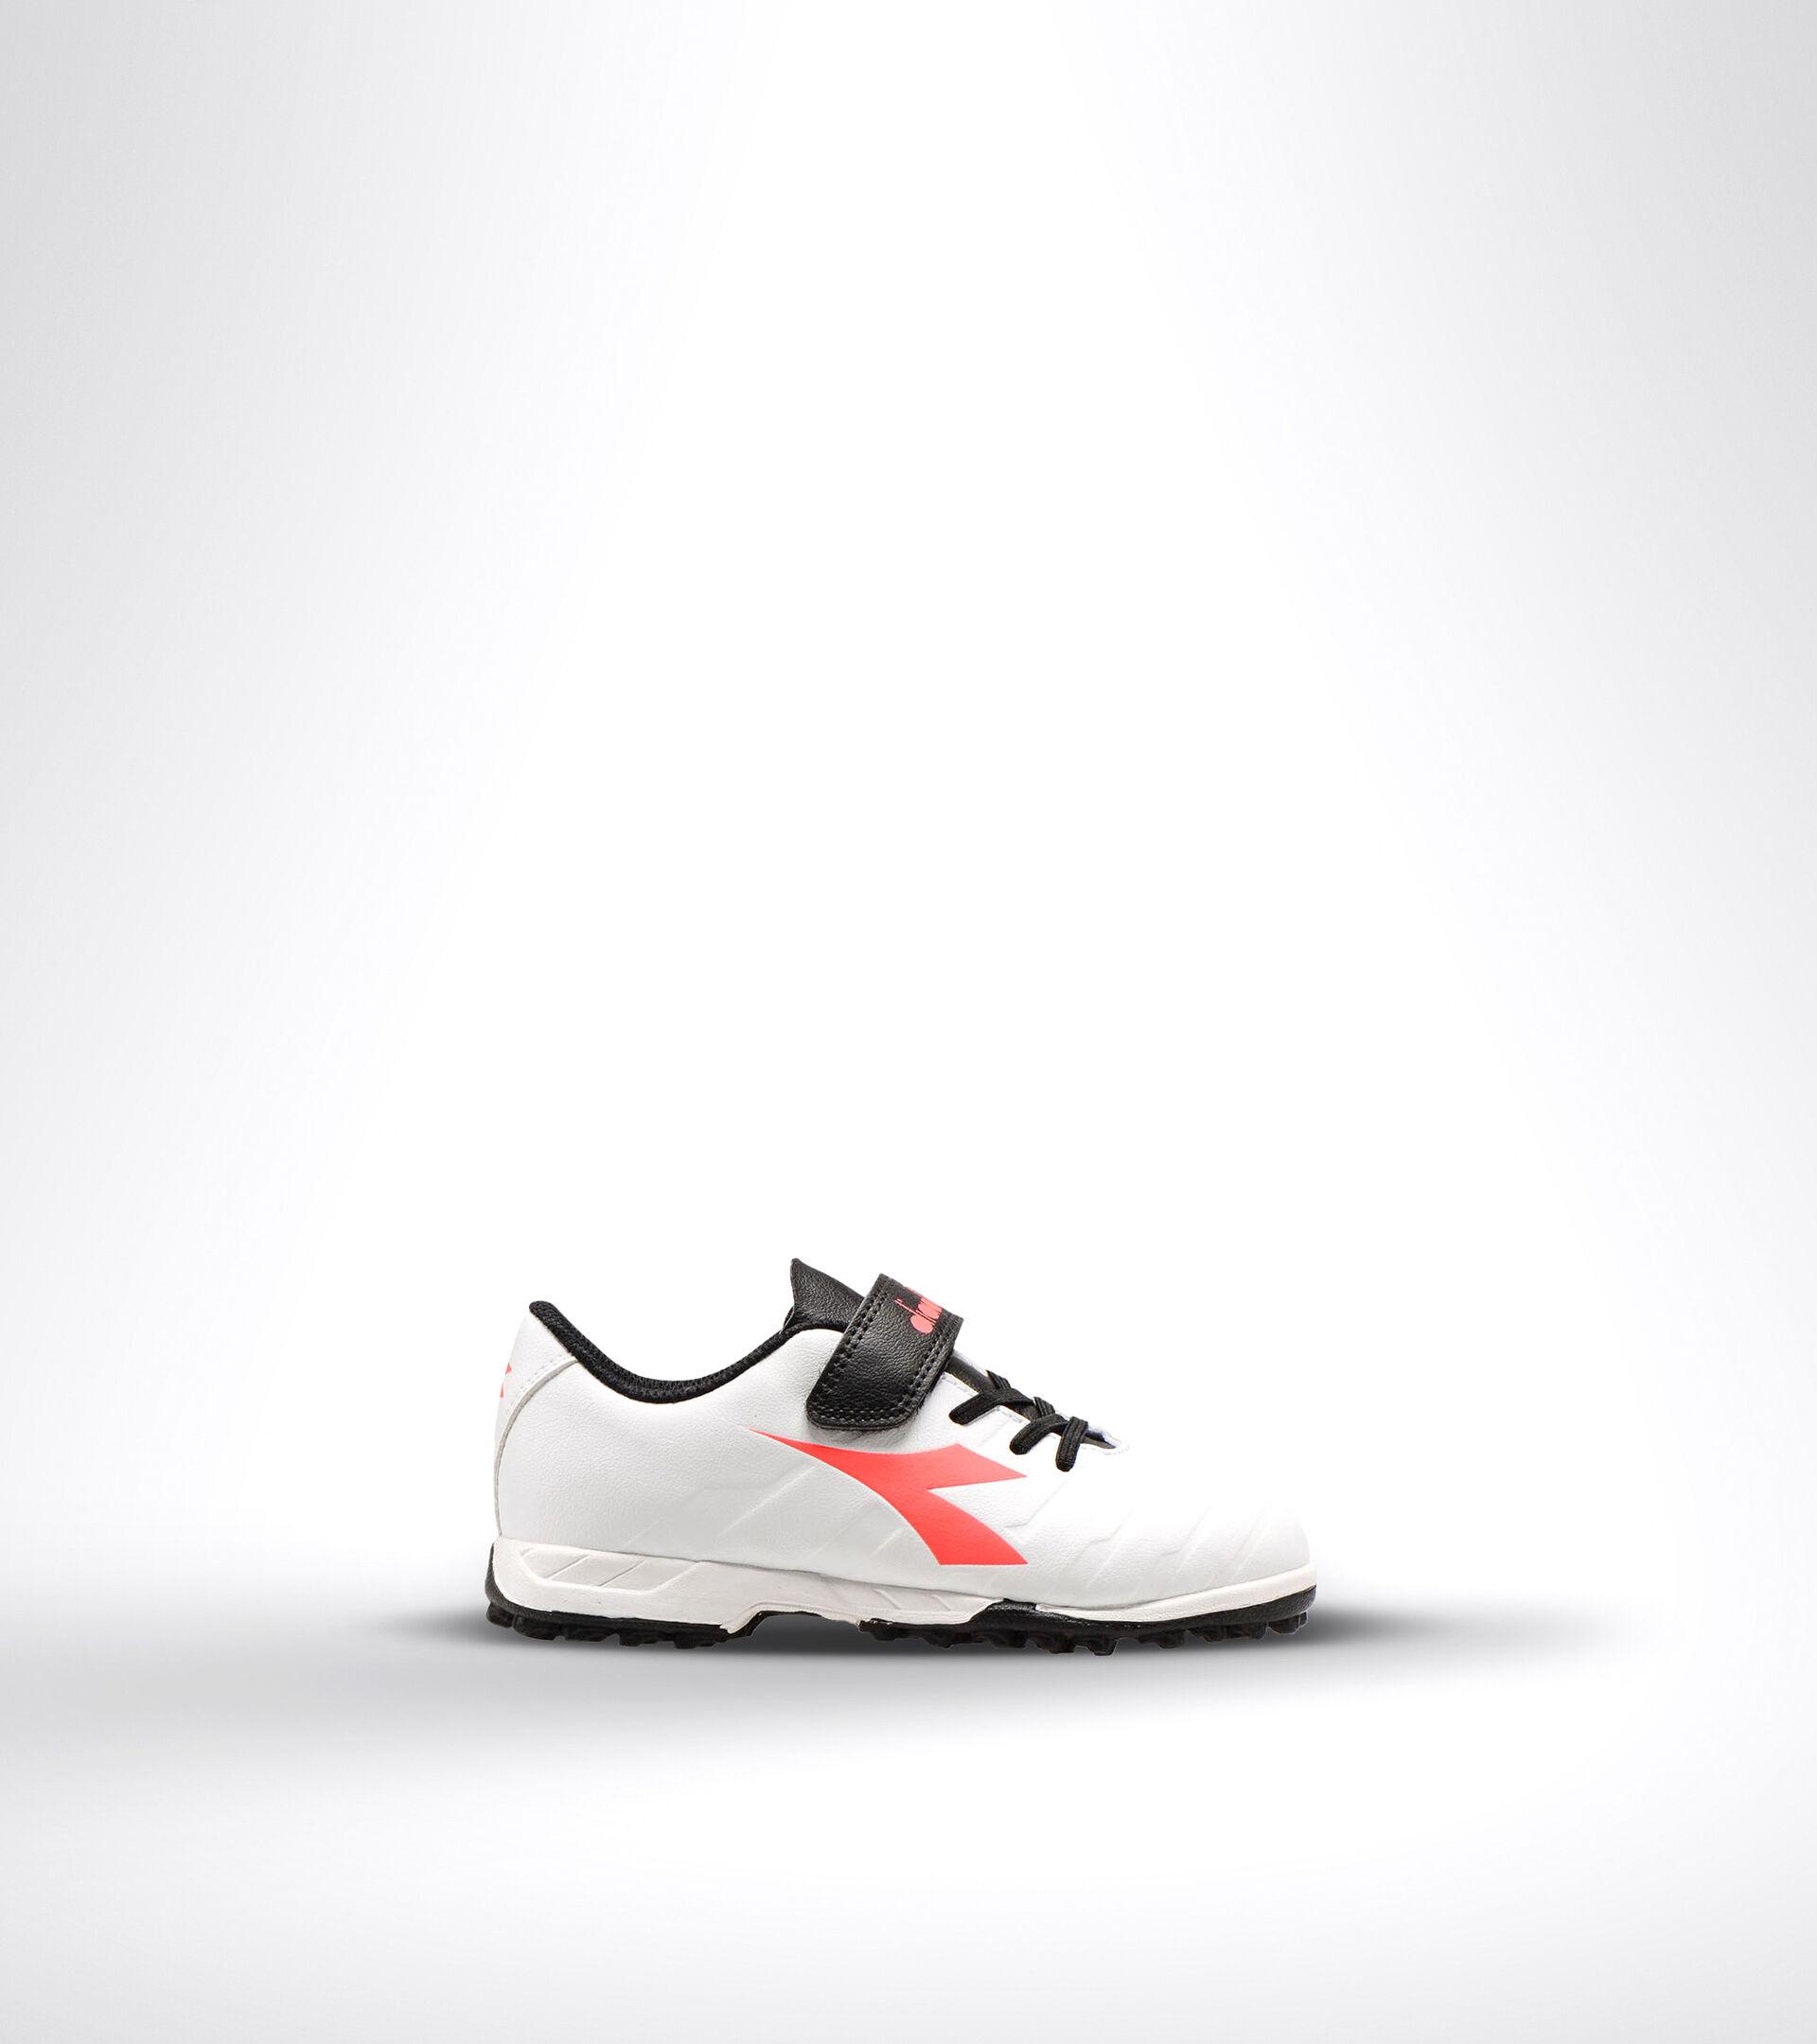 Footwear Sport BAMBINO PICHICHI 3 TF JR VE WHITE/BLACK/RED FLUO Diadora